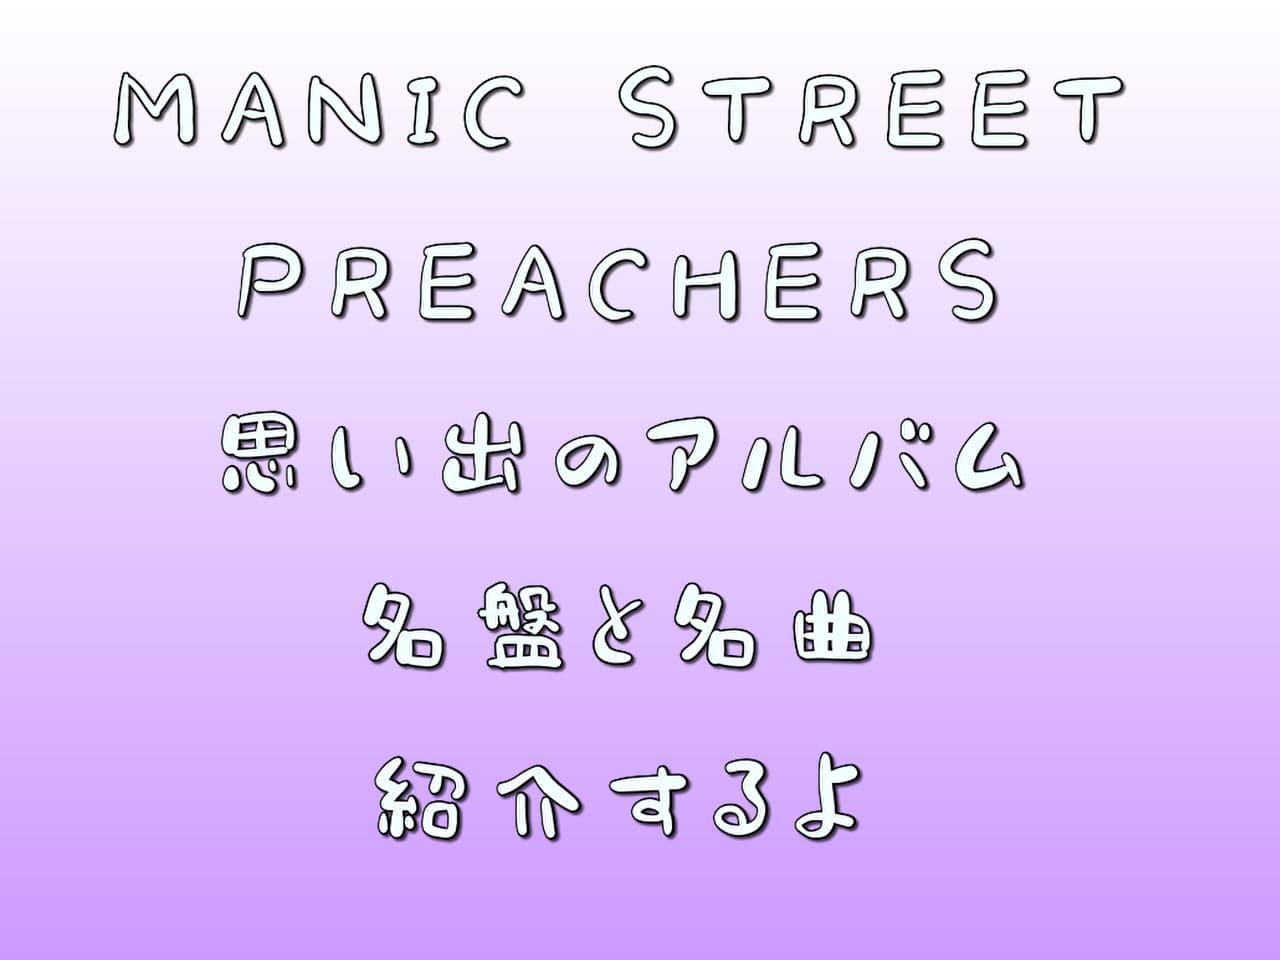 MANIC STREET PREACHERSの思い出のアルバムと名盤と名曲を紹介するよ